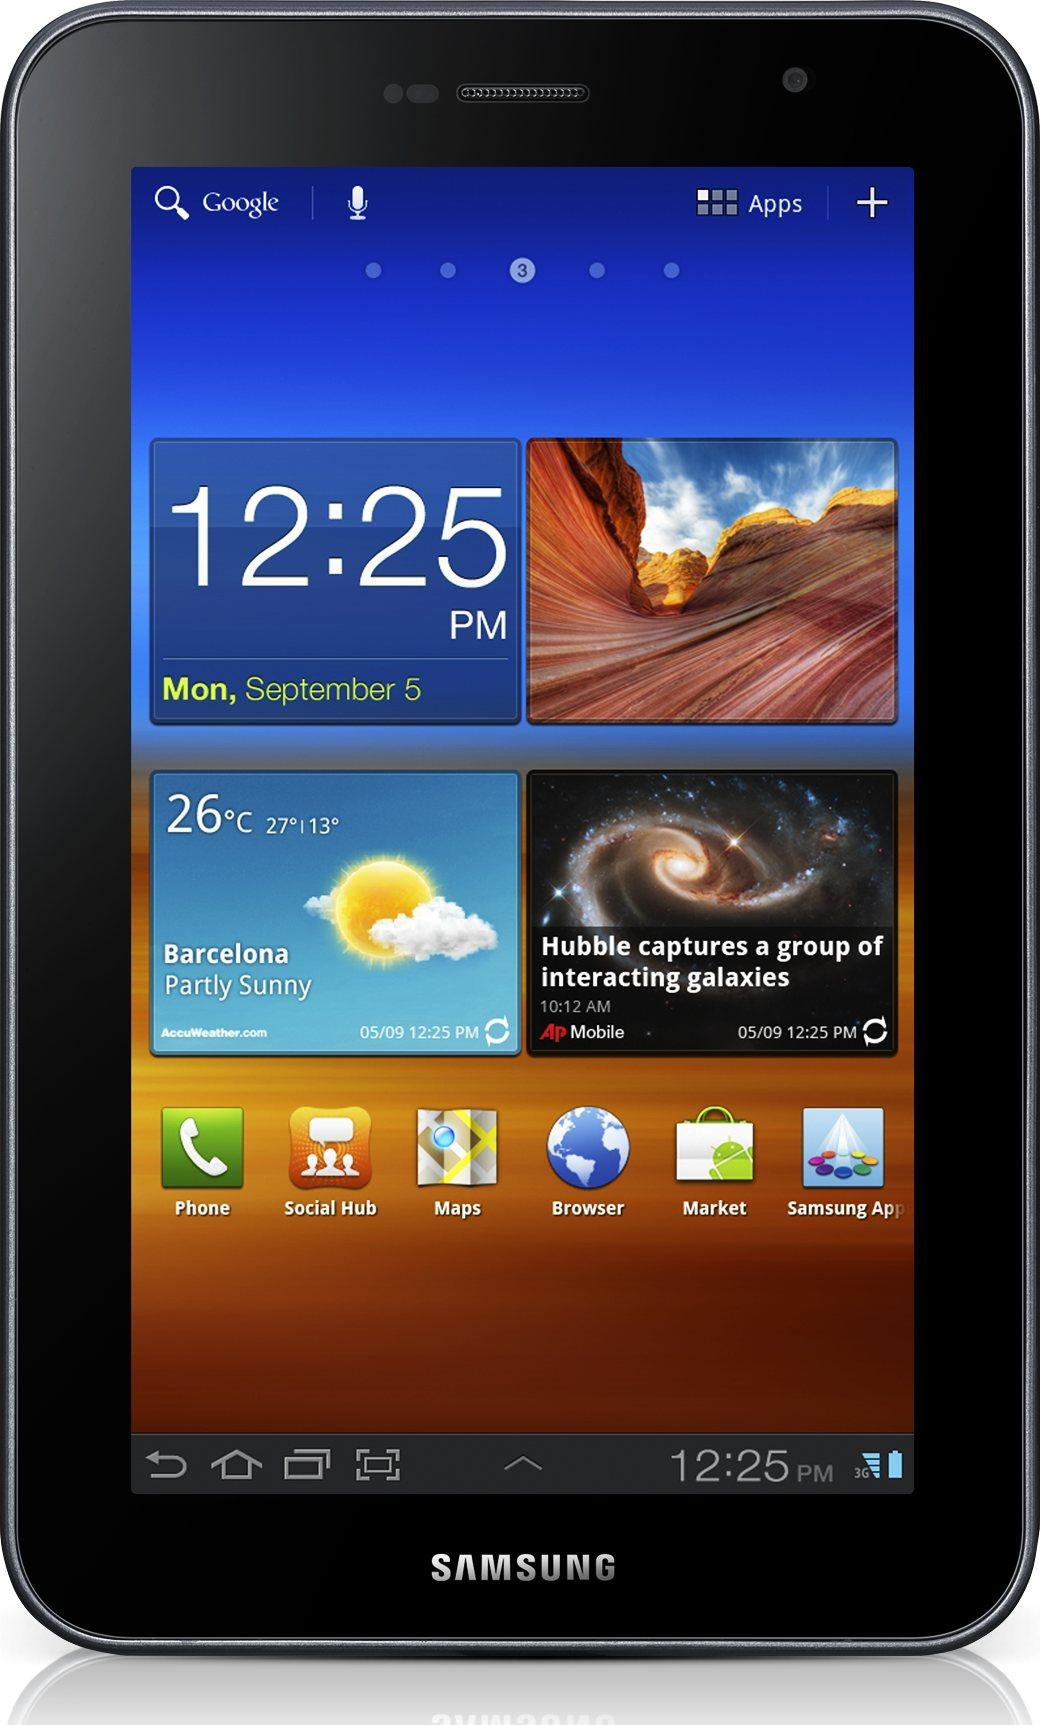 Galaxy Tab 7.0 Plus GT-P6200